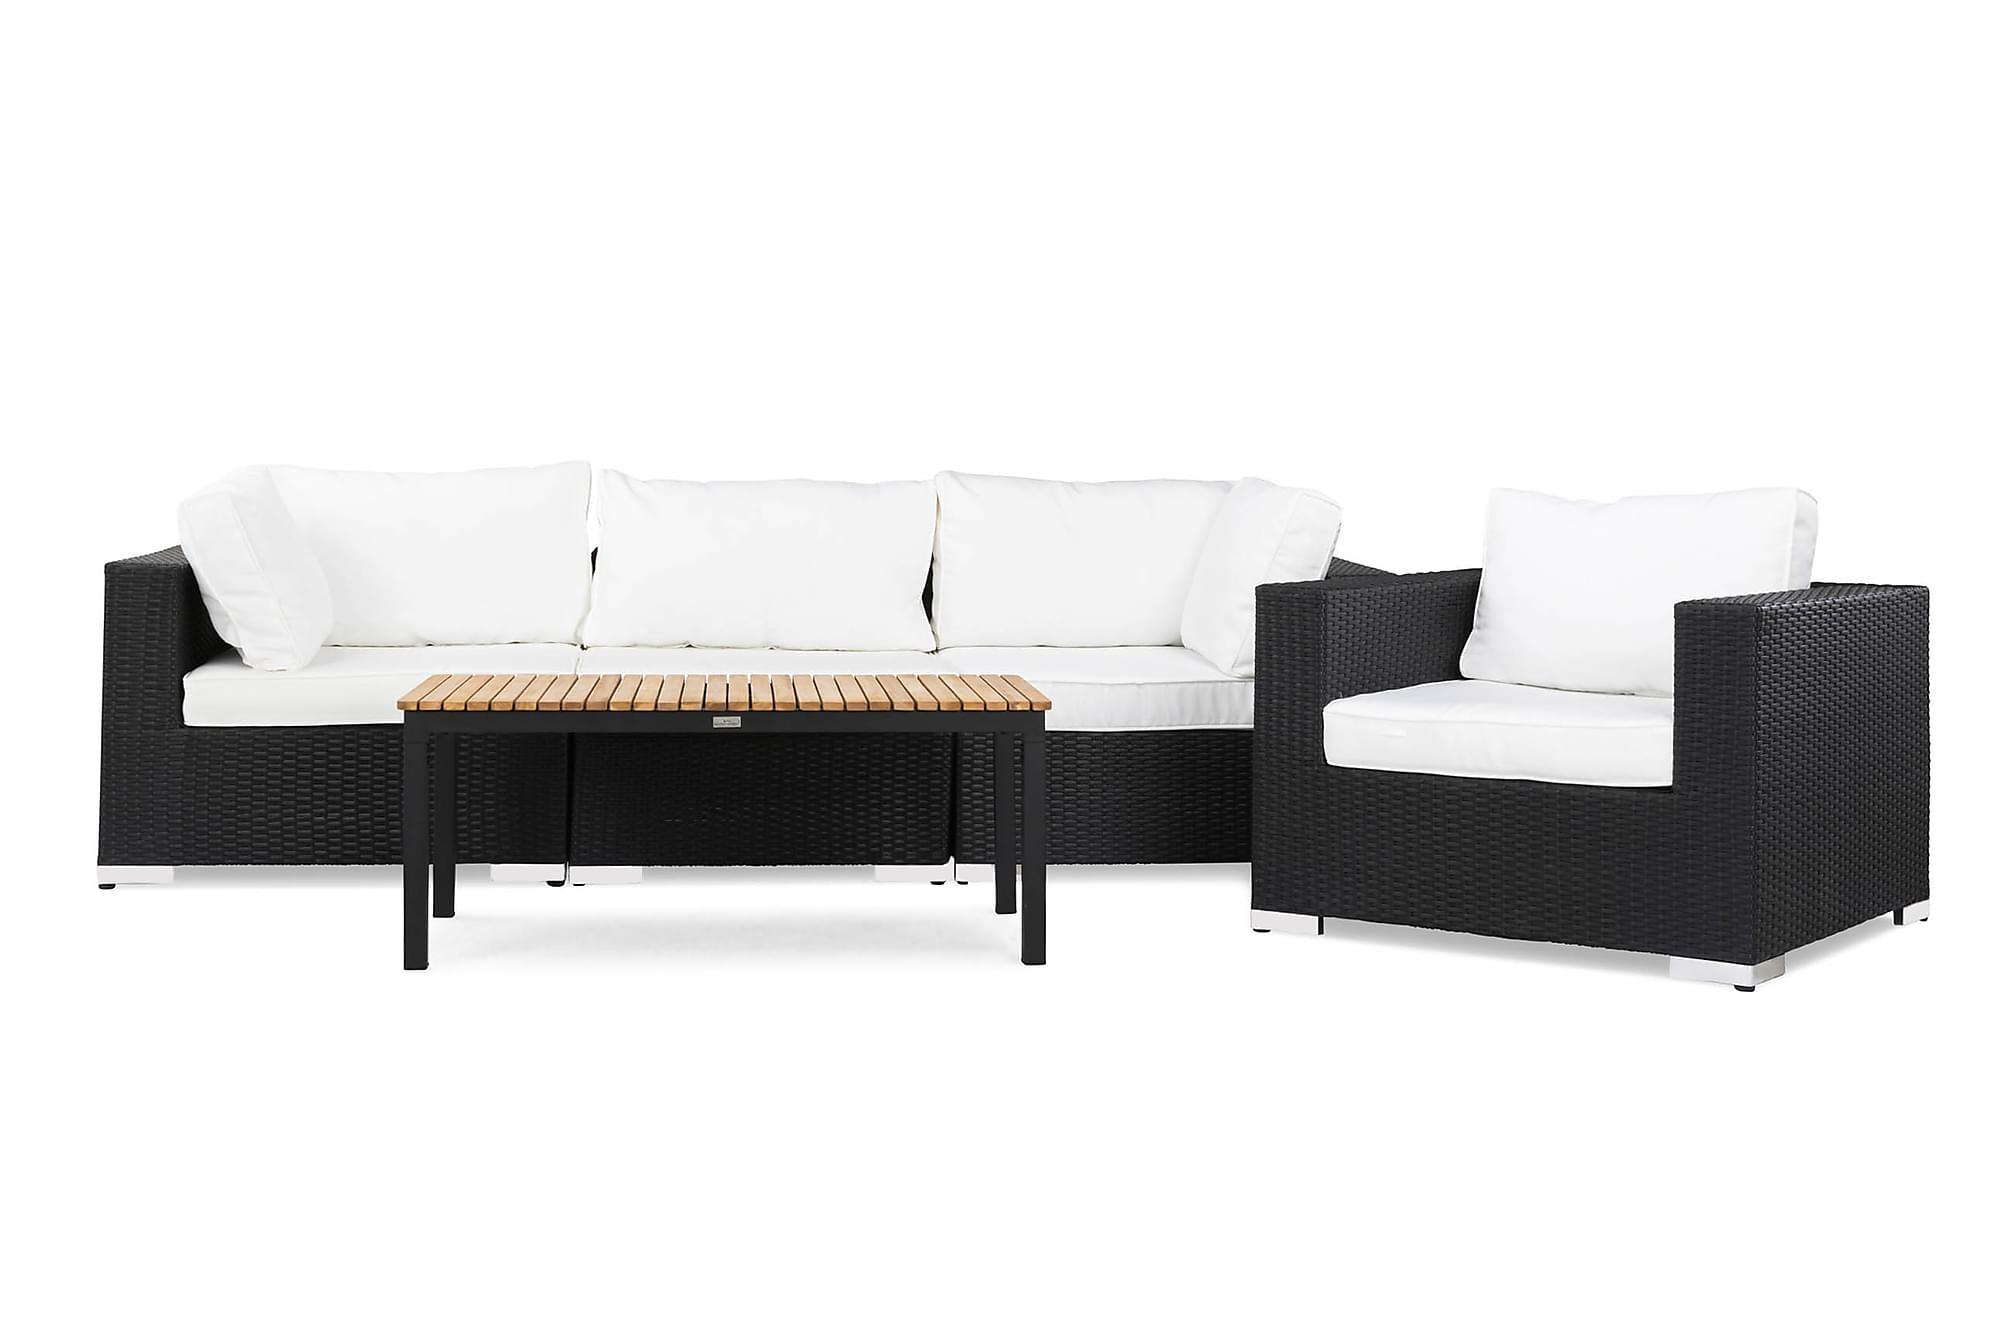 BAHAMAS Loungesoffa 3-sits + Bord Svart/Teak + Fåtölj Svart